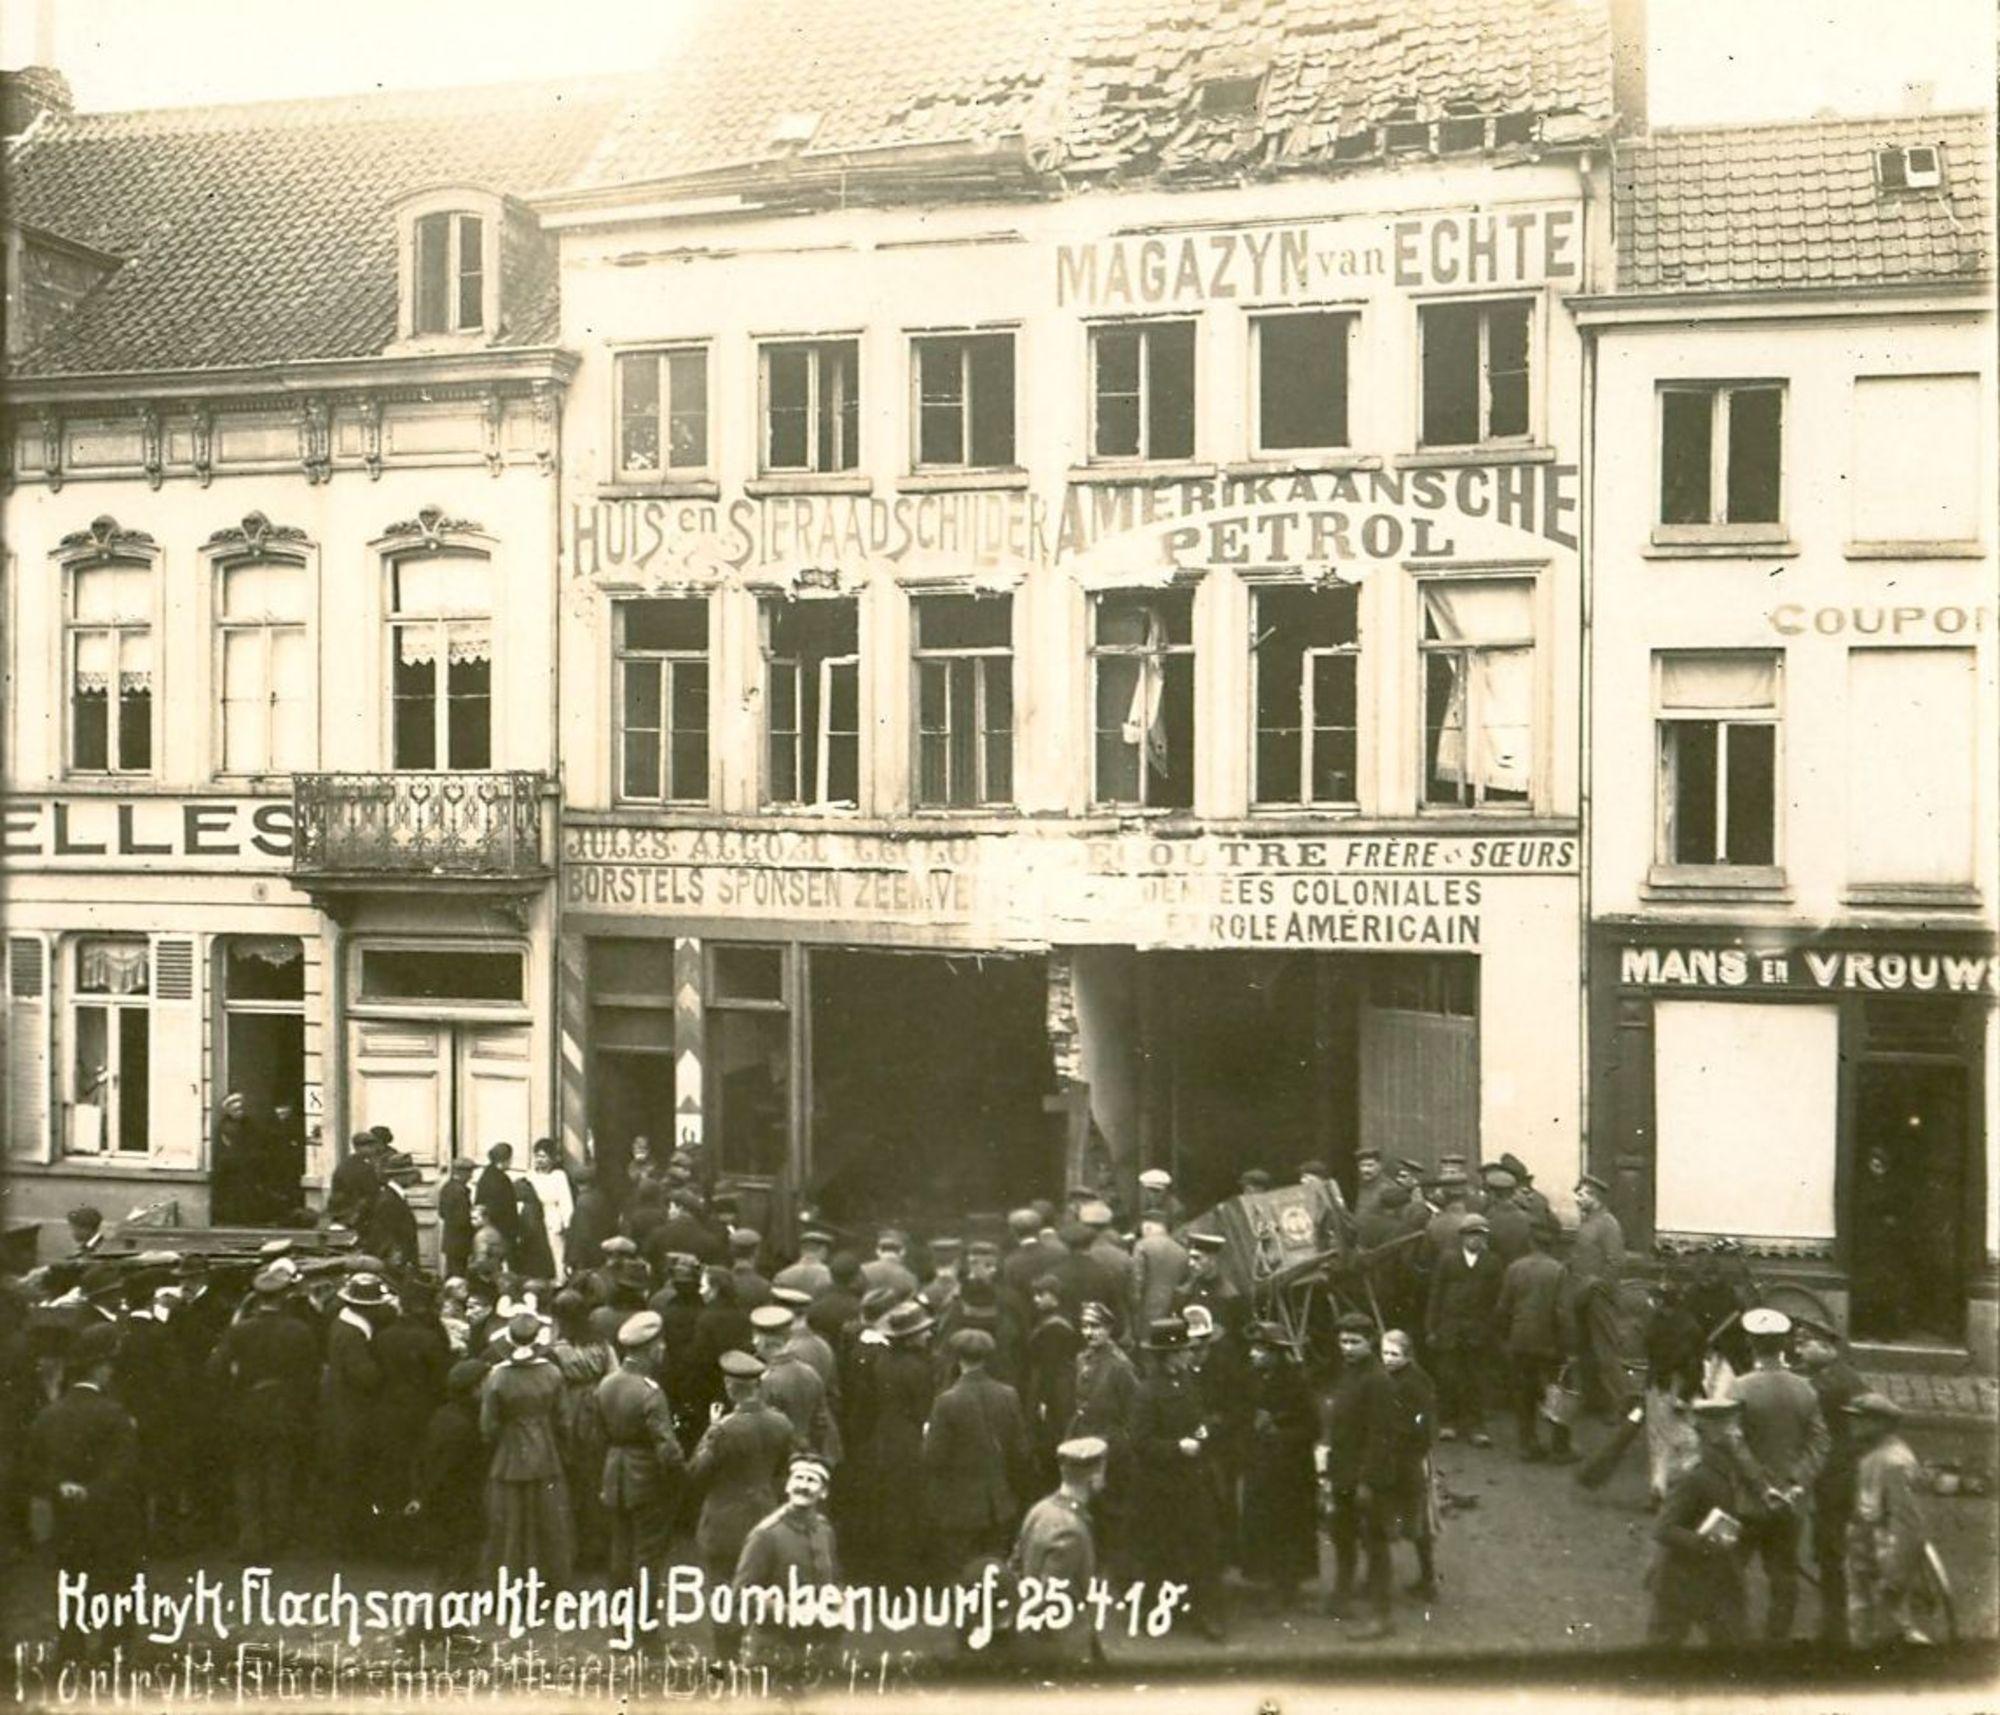 Vlasmarkt in 1918